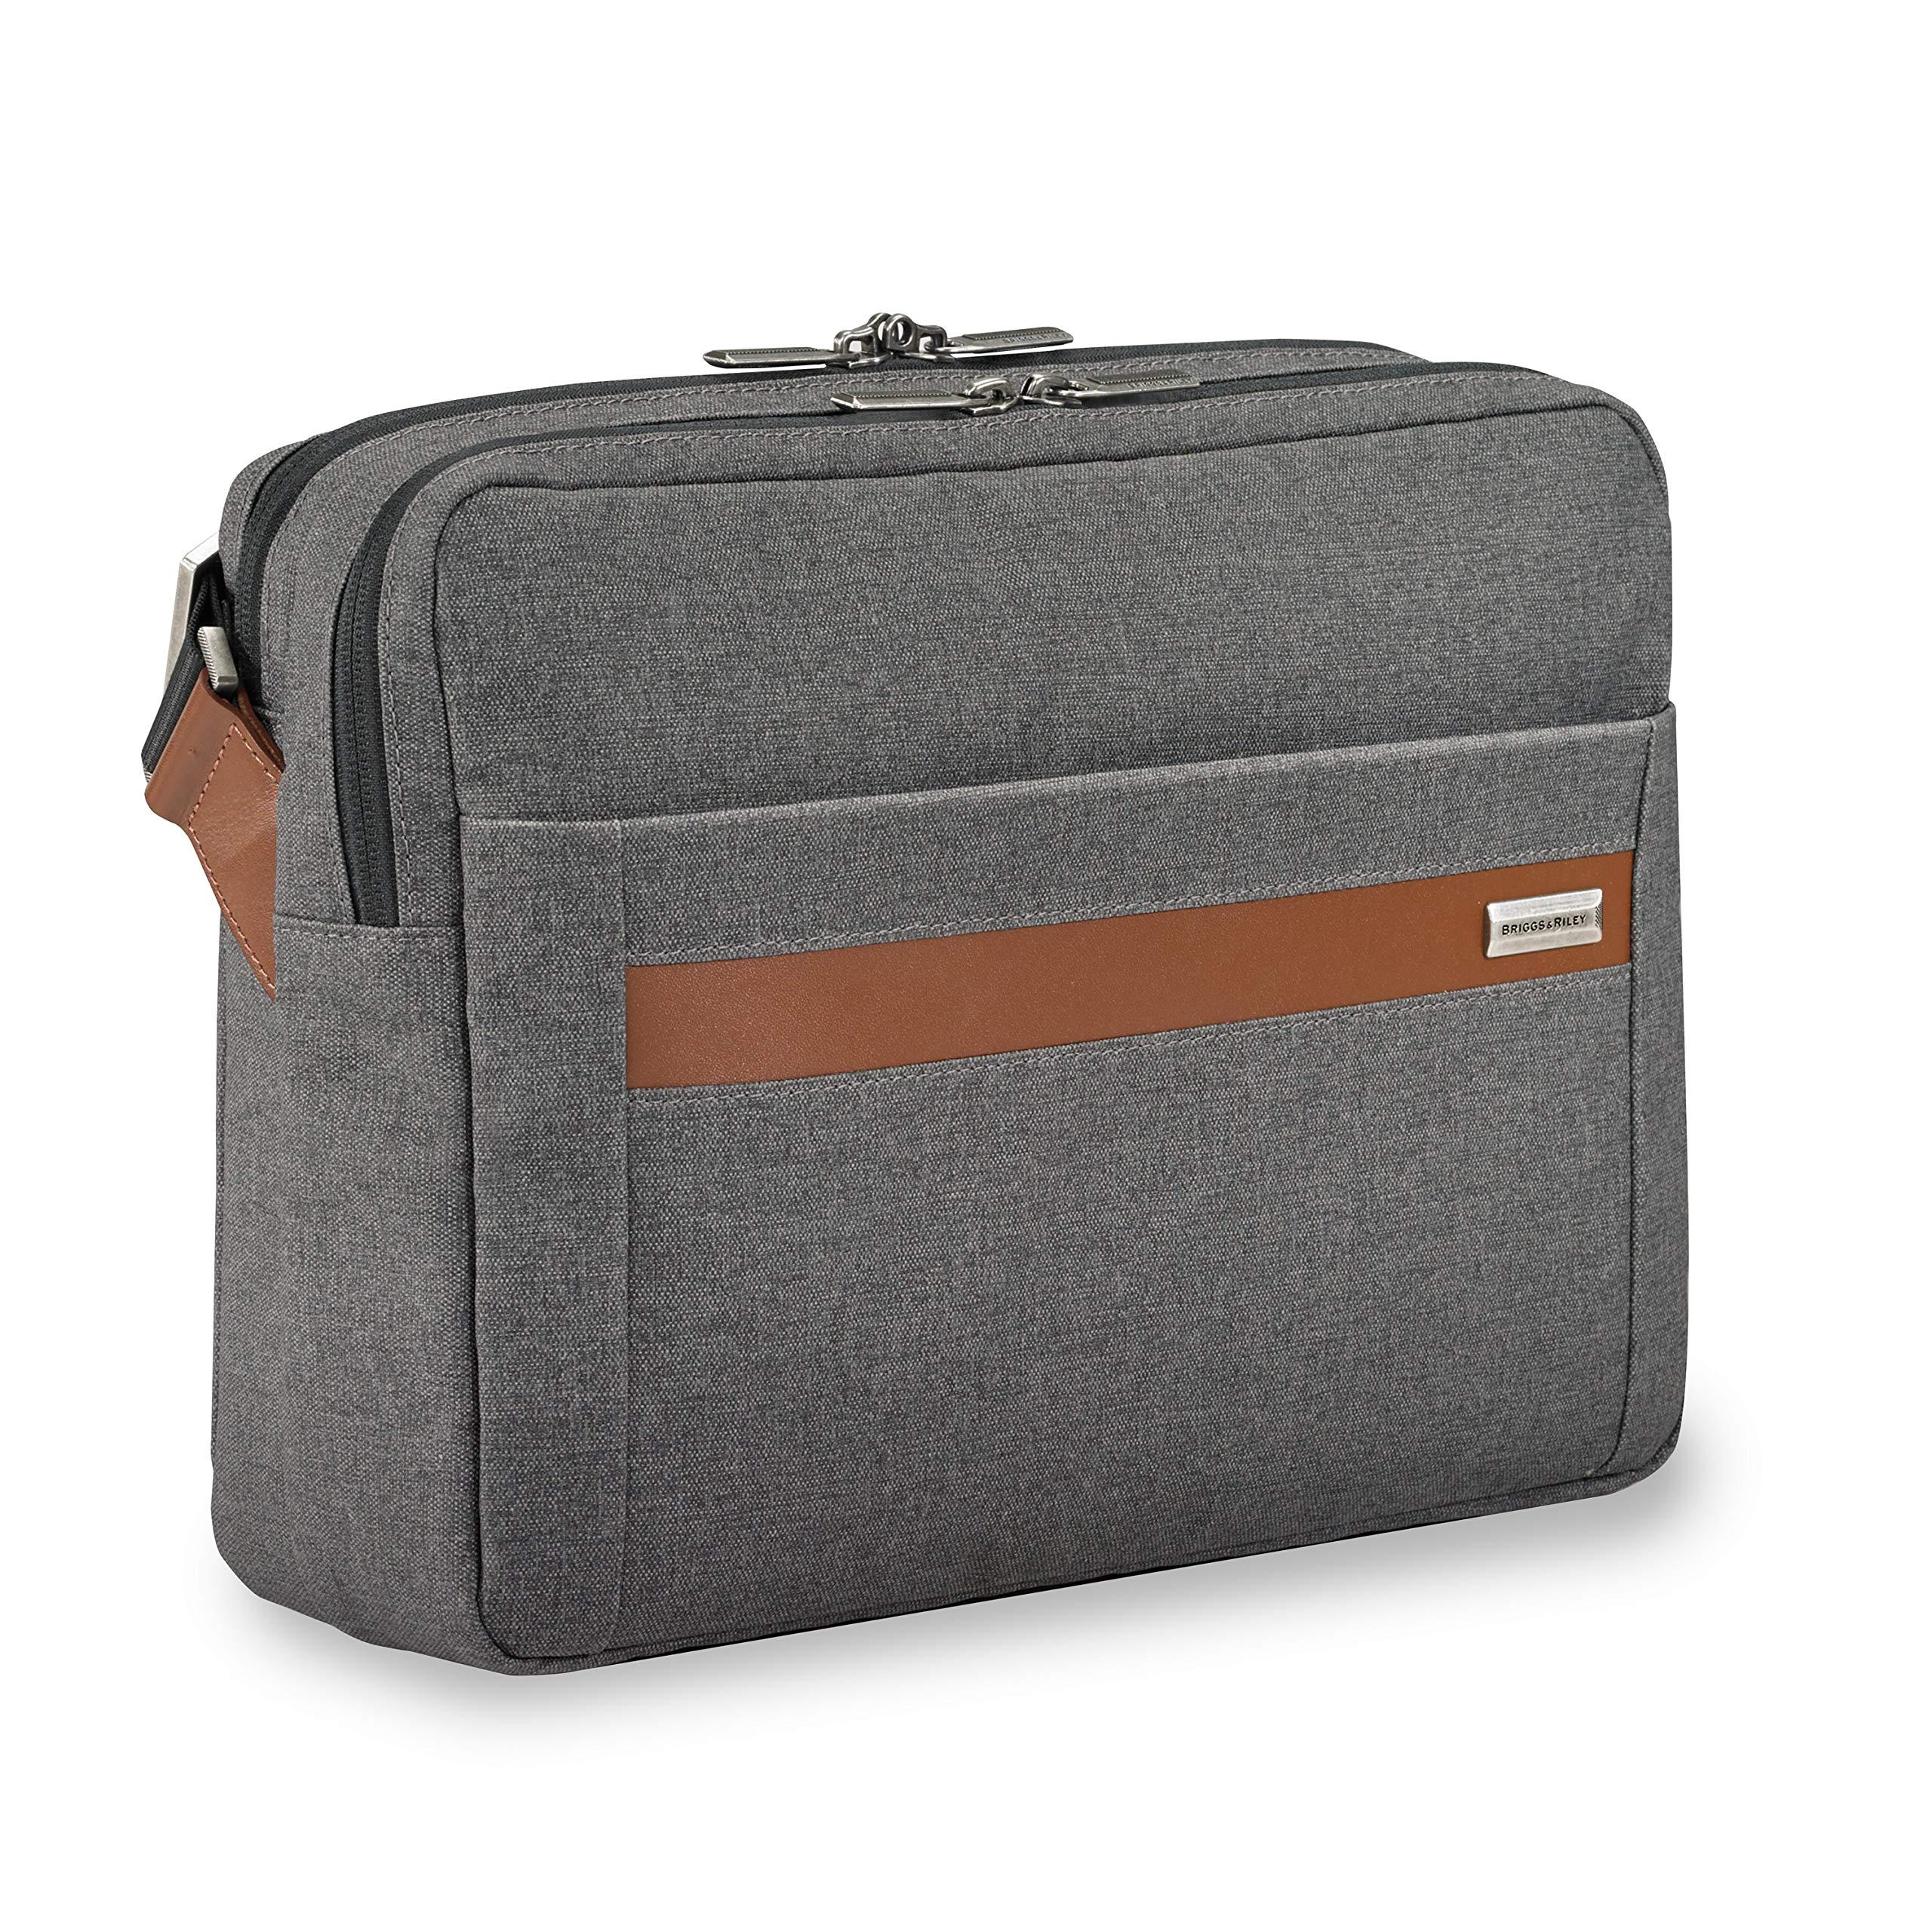 Briggs & Riley Kinzie Street Micro Messenger Laptop Bag, Grey, One Size